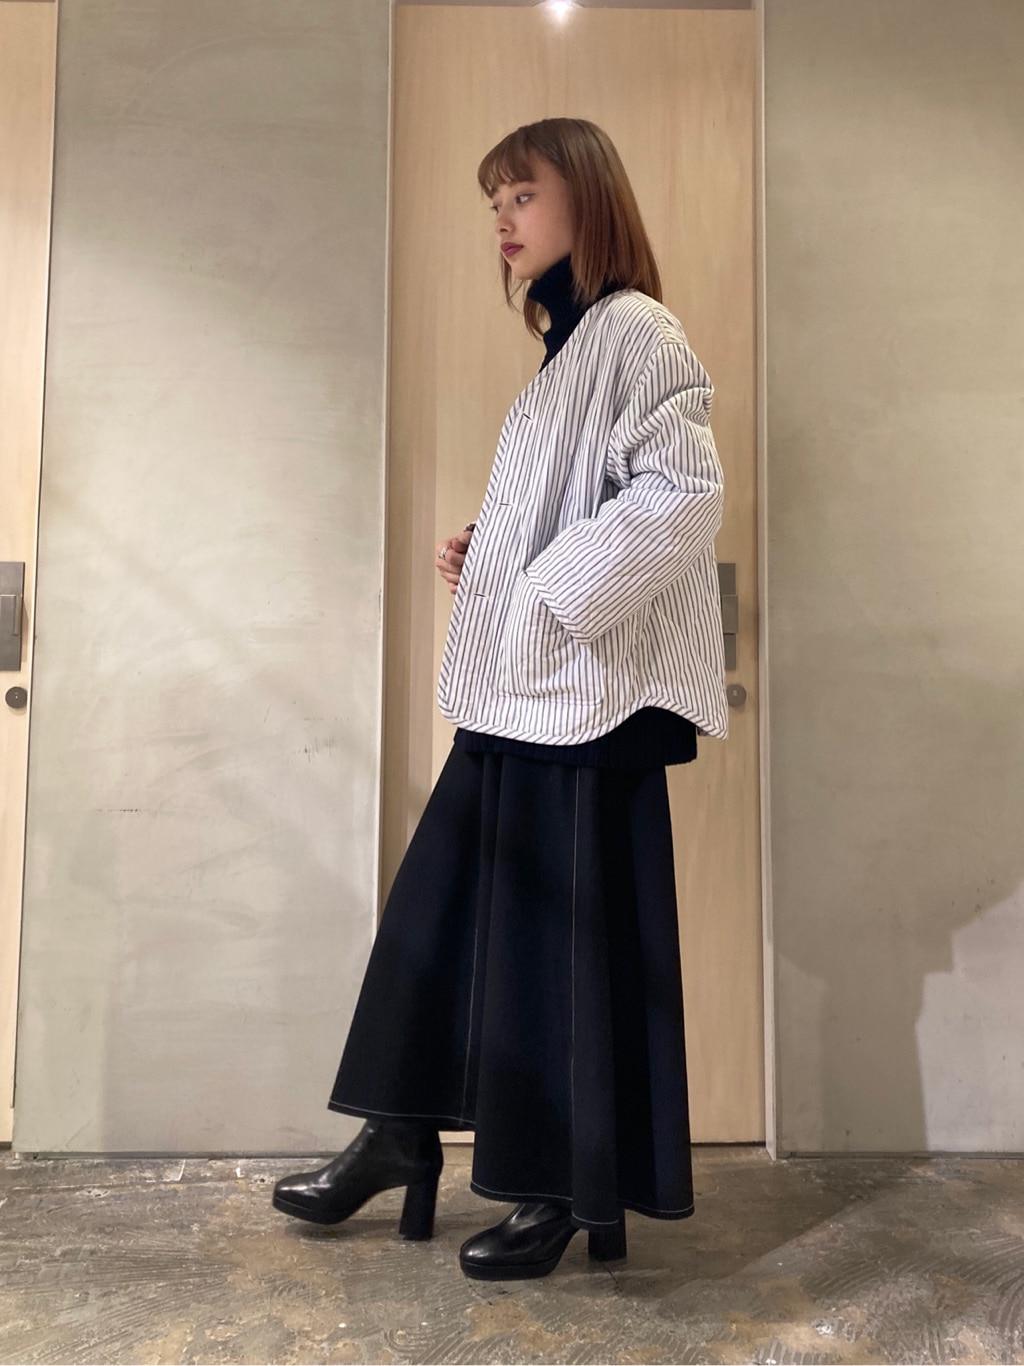 note et silence. ルミネ新宿 身長:160cm 2021.01.26